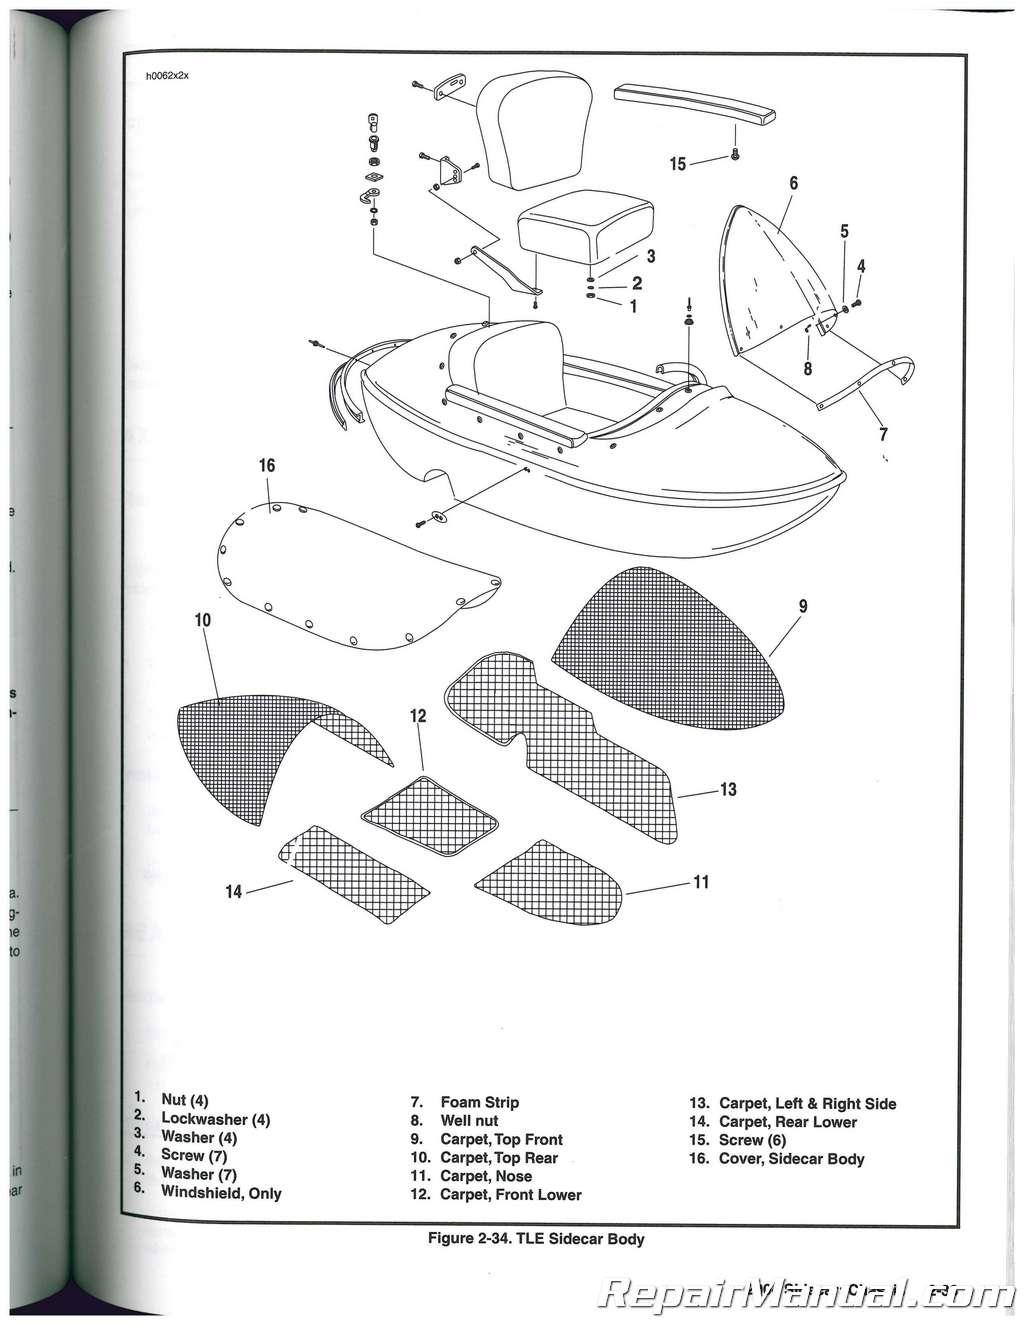 1999-2004 Harley Davidson Sidecar Service Manual